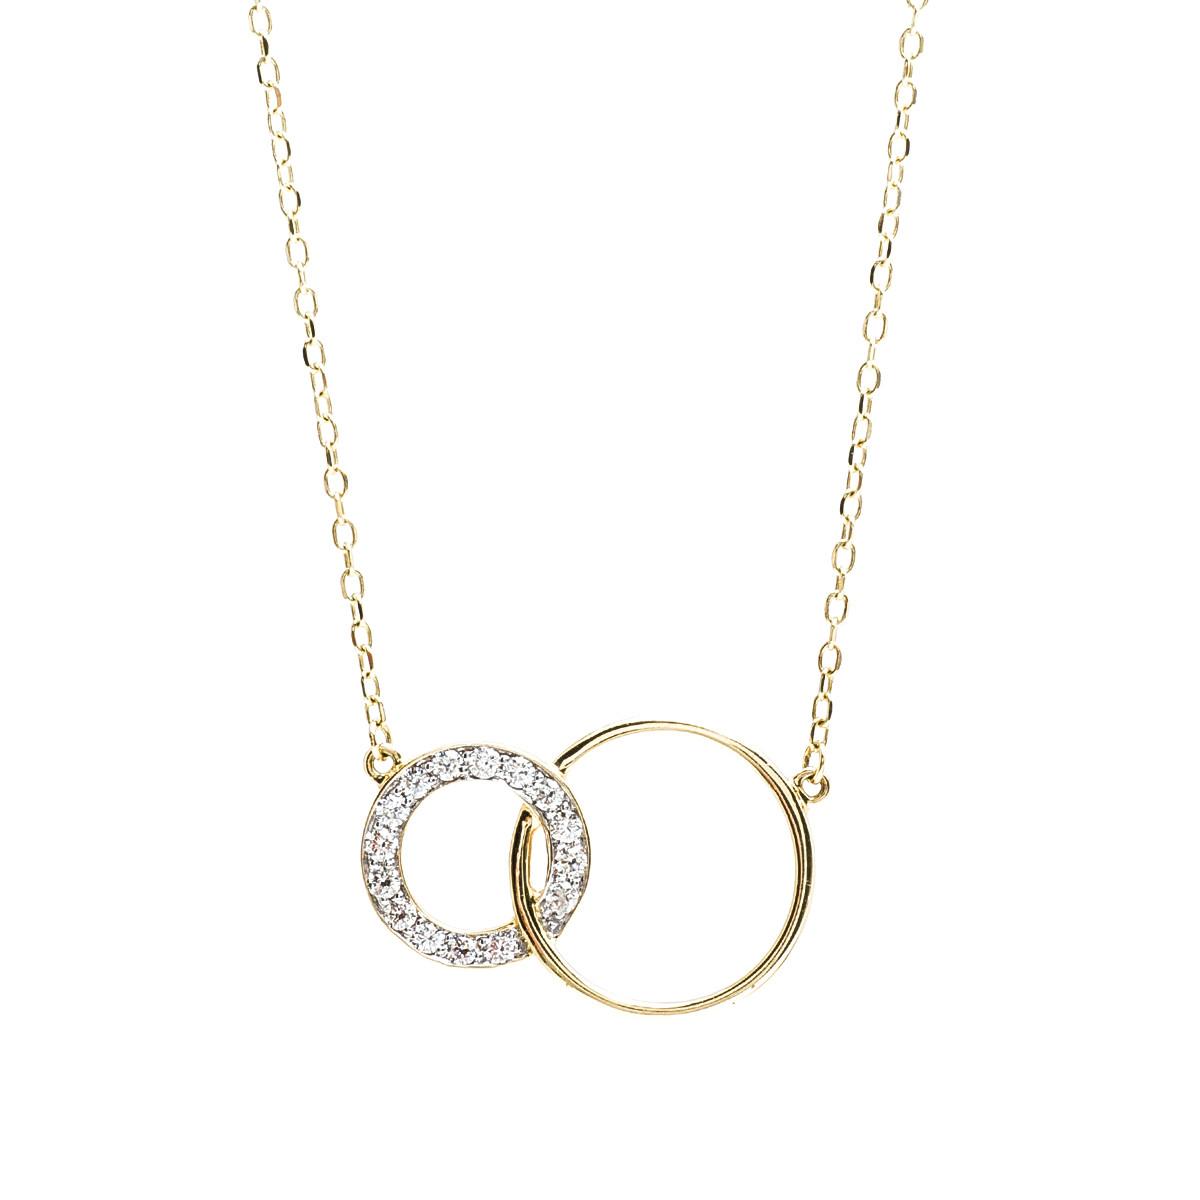 New 0.25 CTW Diamond Interlocking Necklace